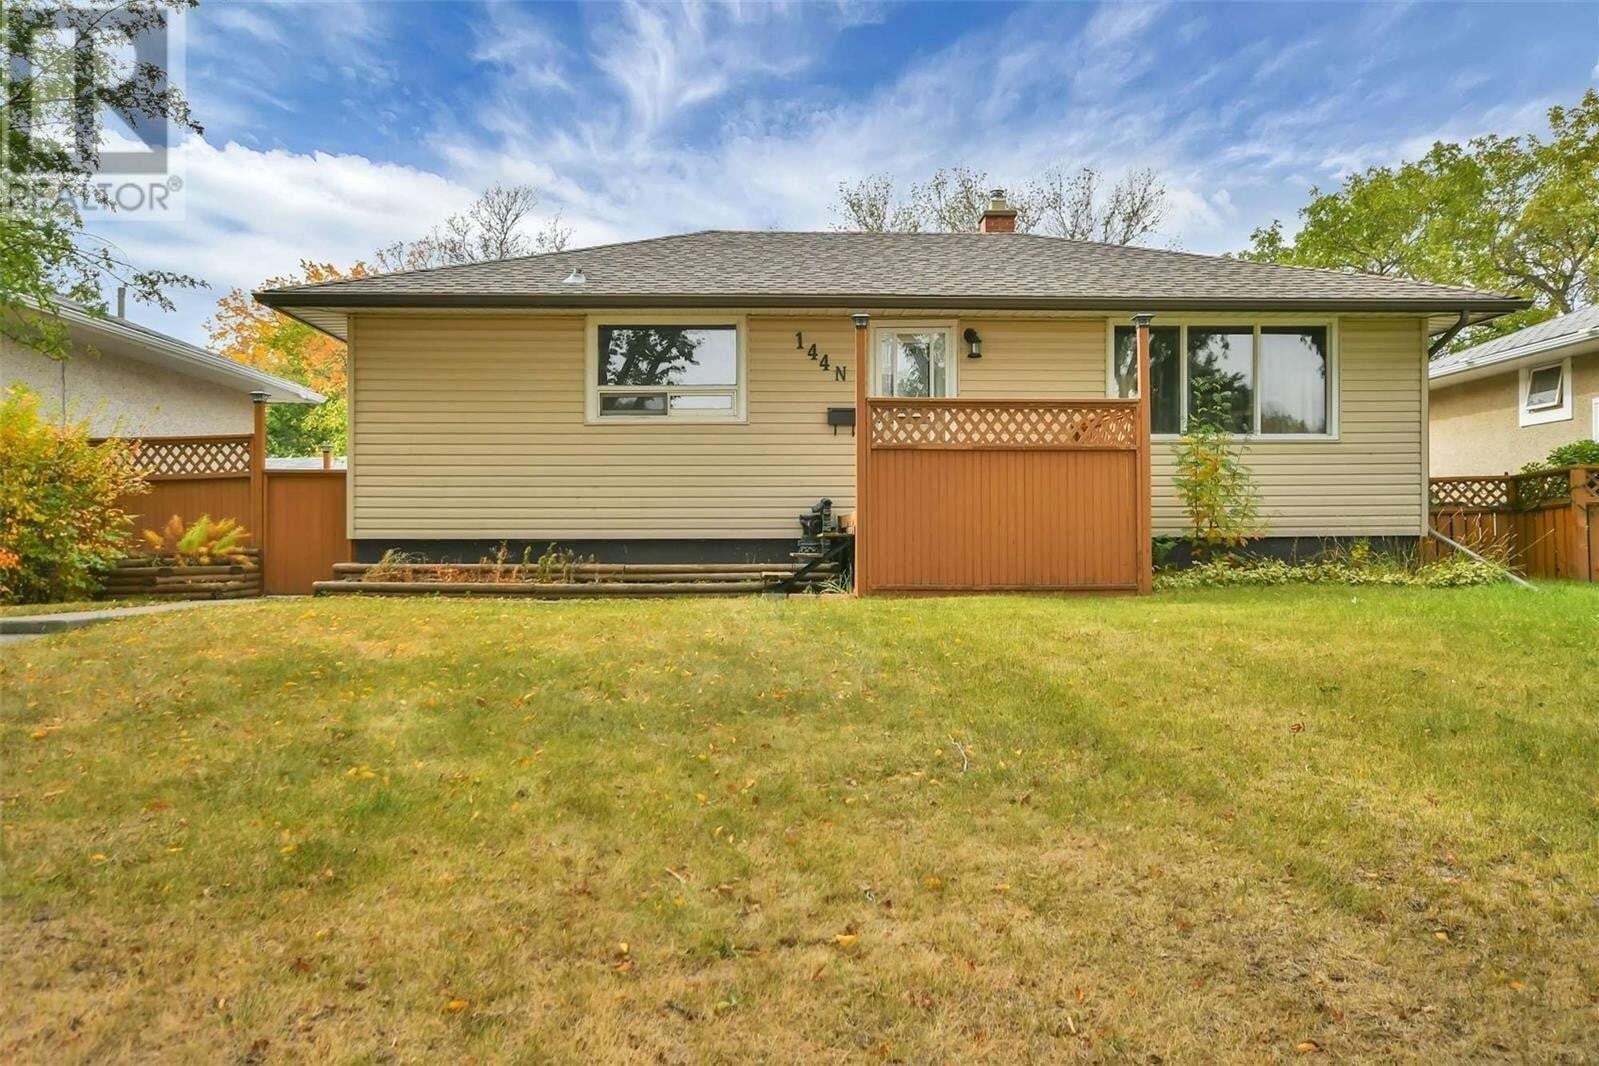 House for sale at 144 Toronto St N Regina Saskatchewan - MLS: SK828155